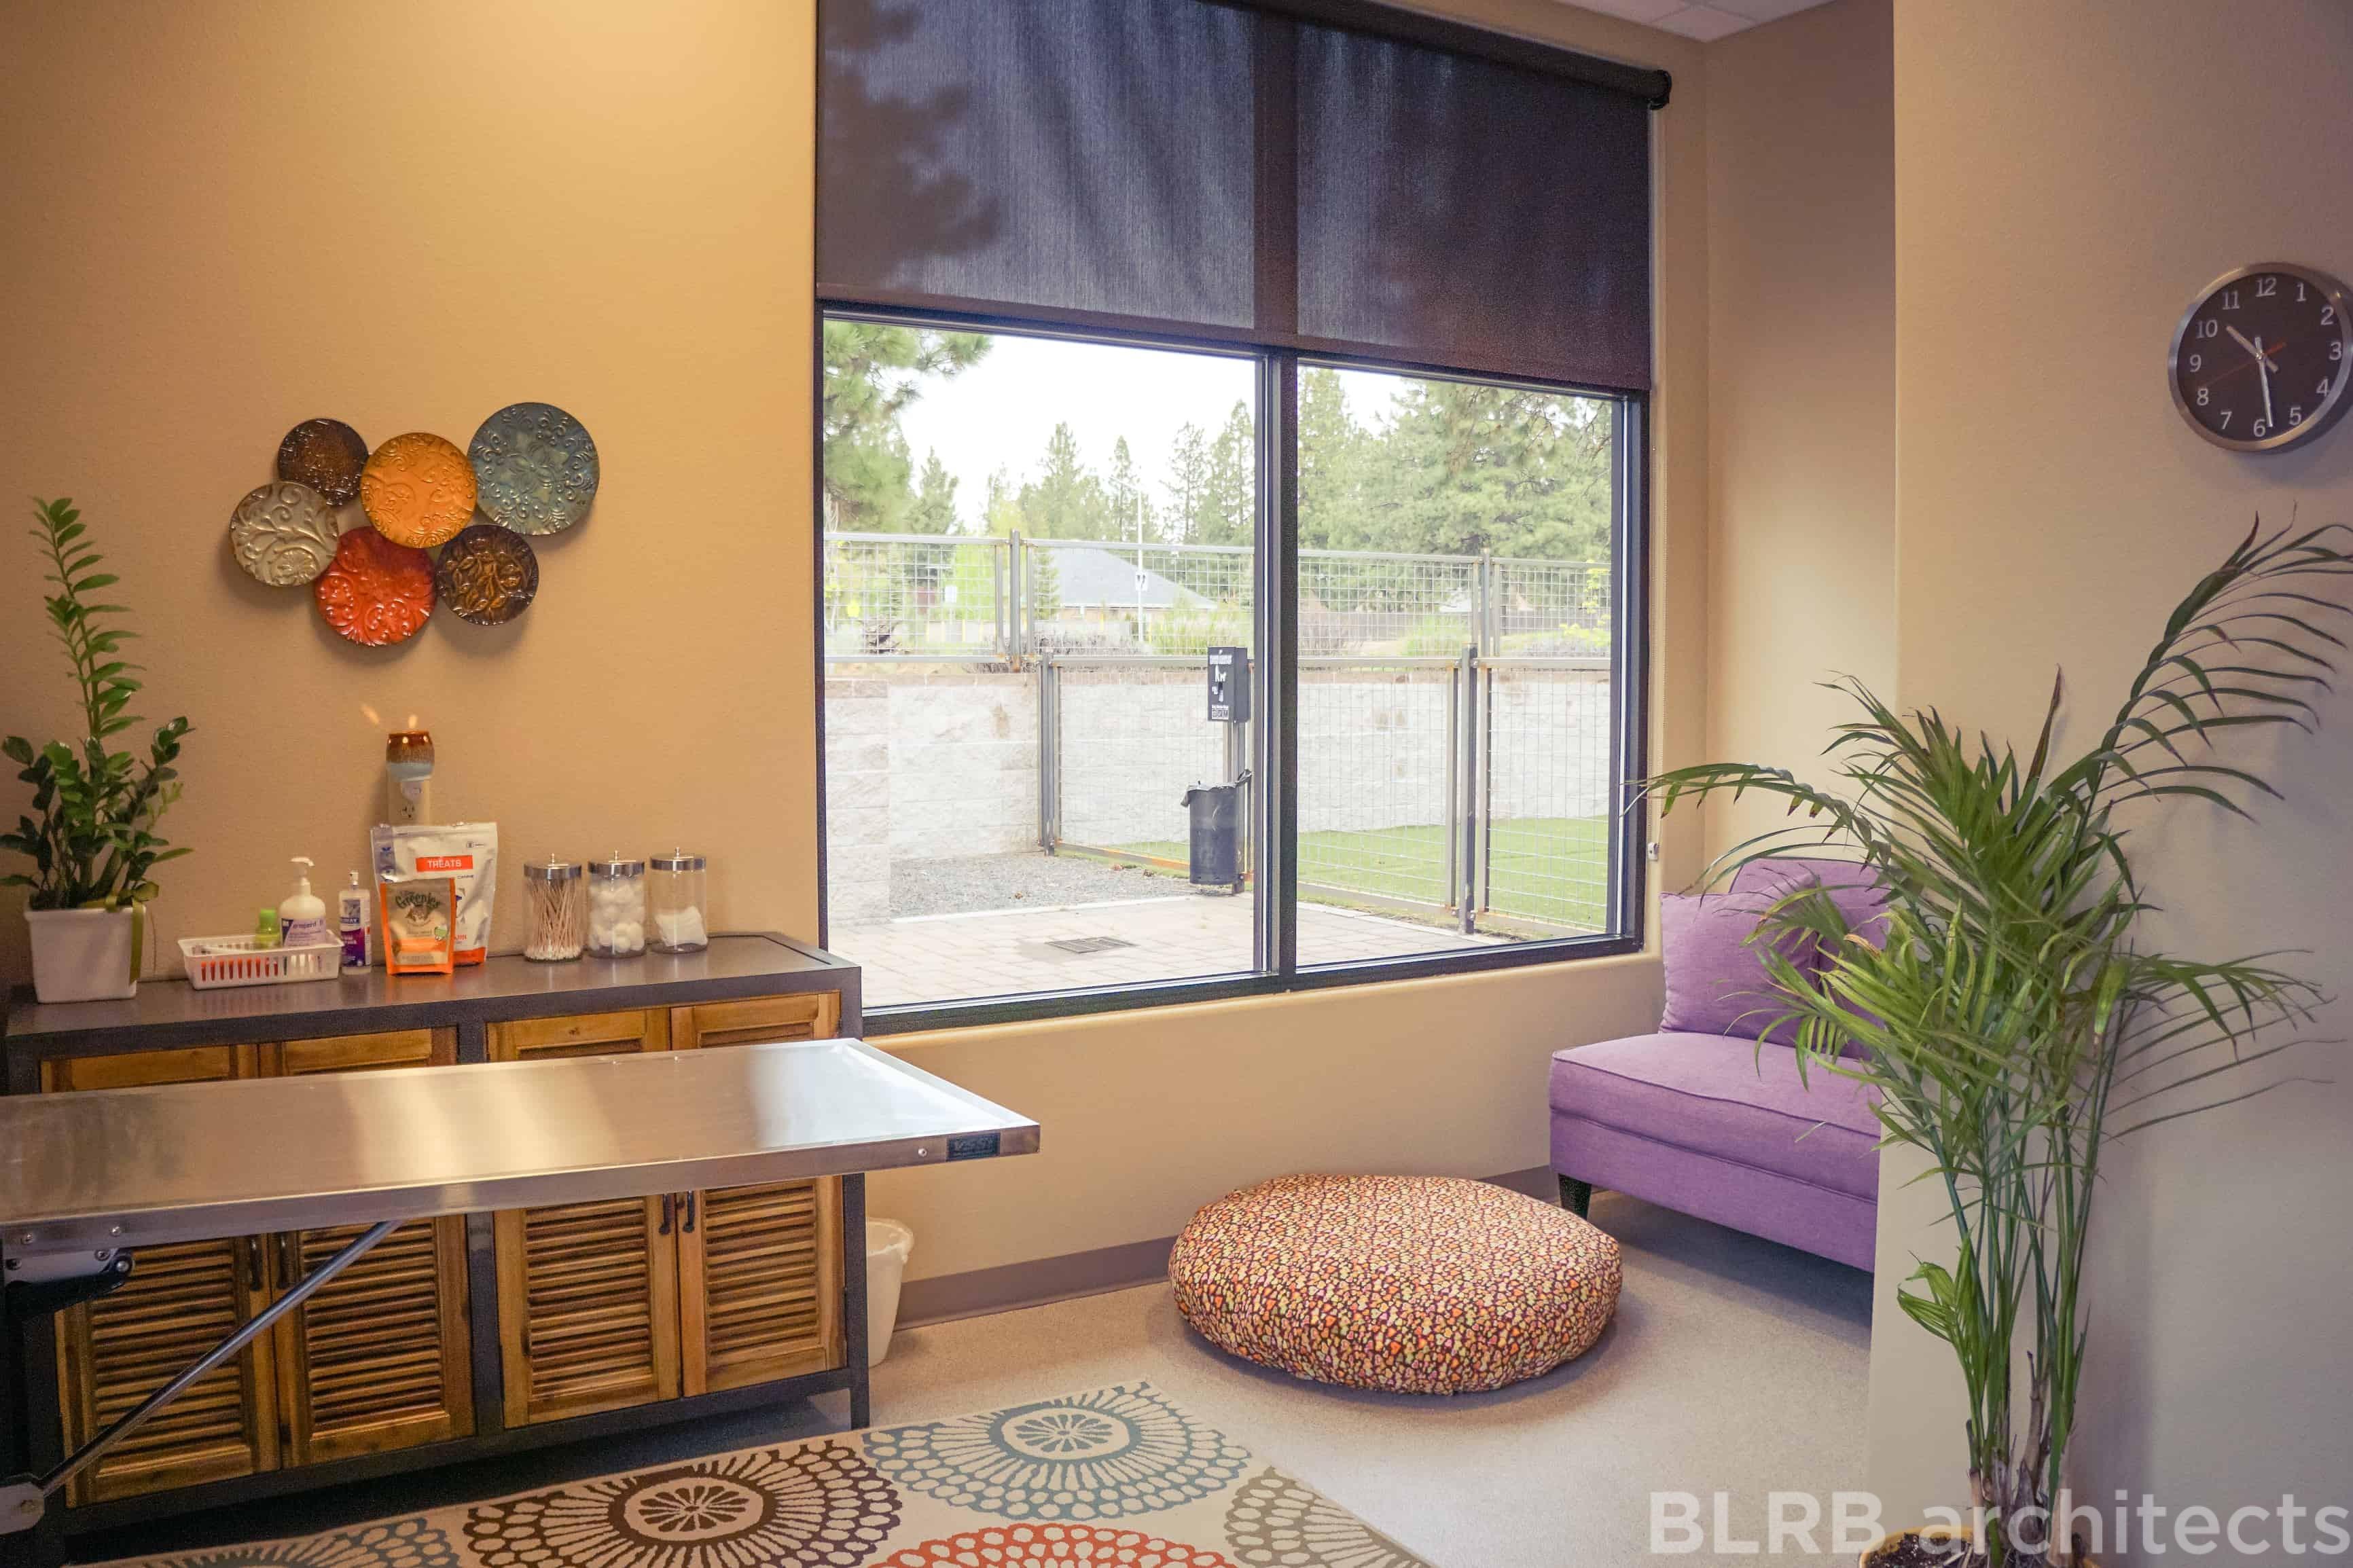 Brookswood veterinary client comfort room interior design for Comfort room interior designs